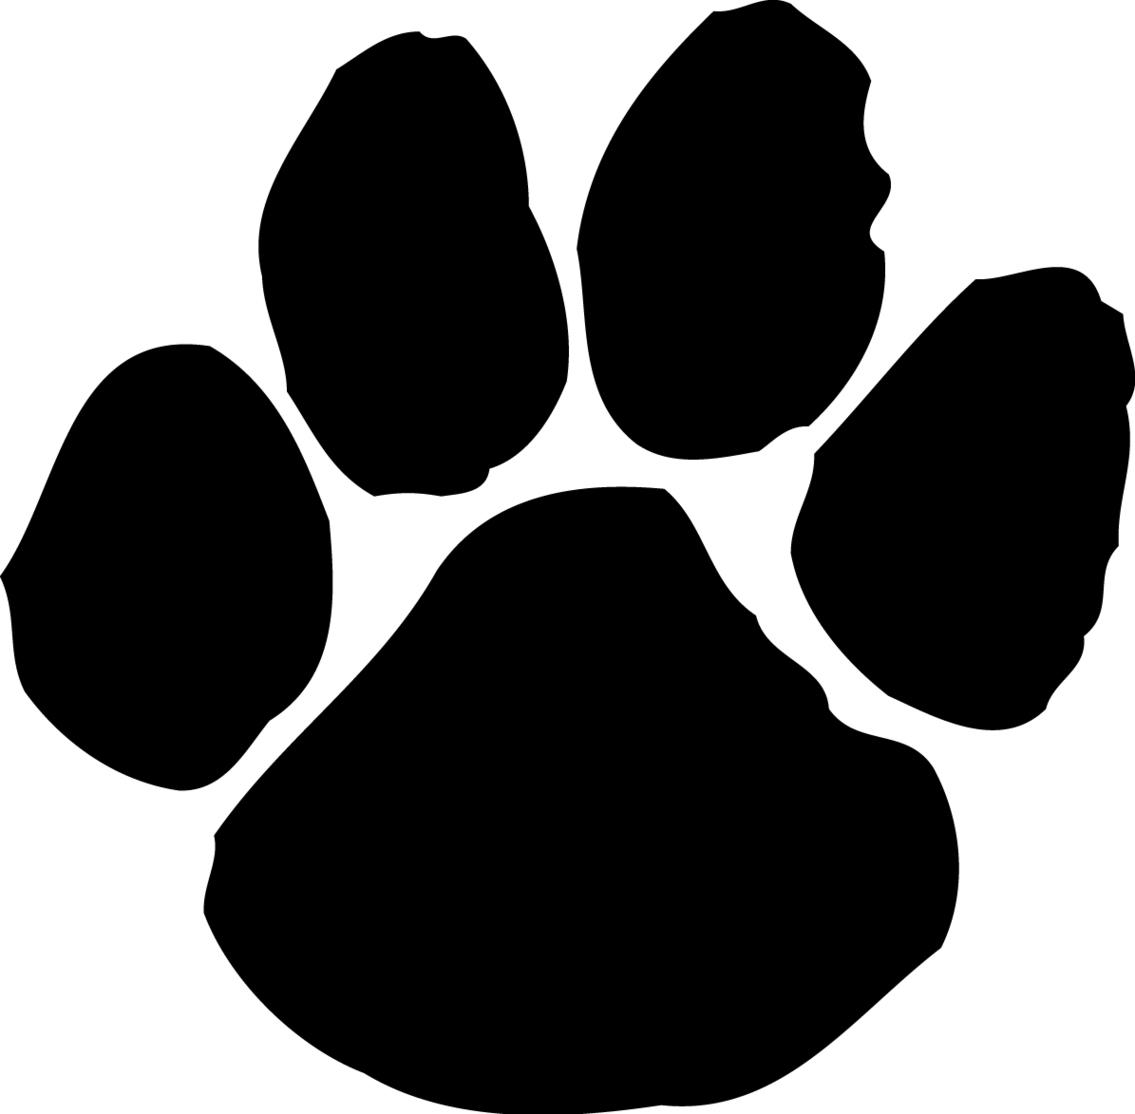 Dog paw jpg clipart. Logo best free to